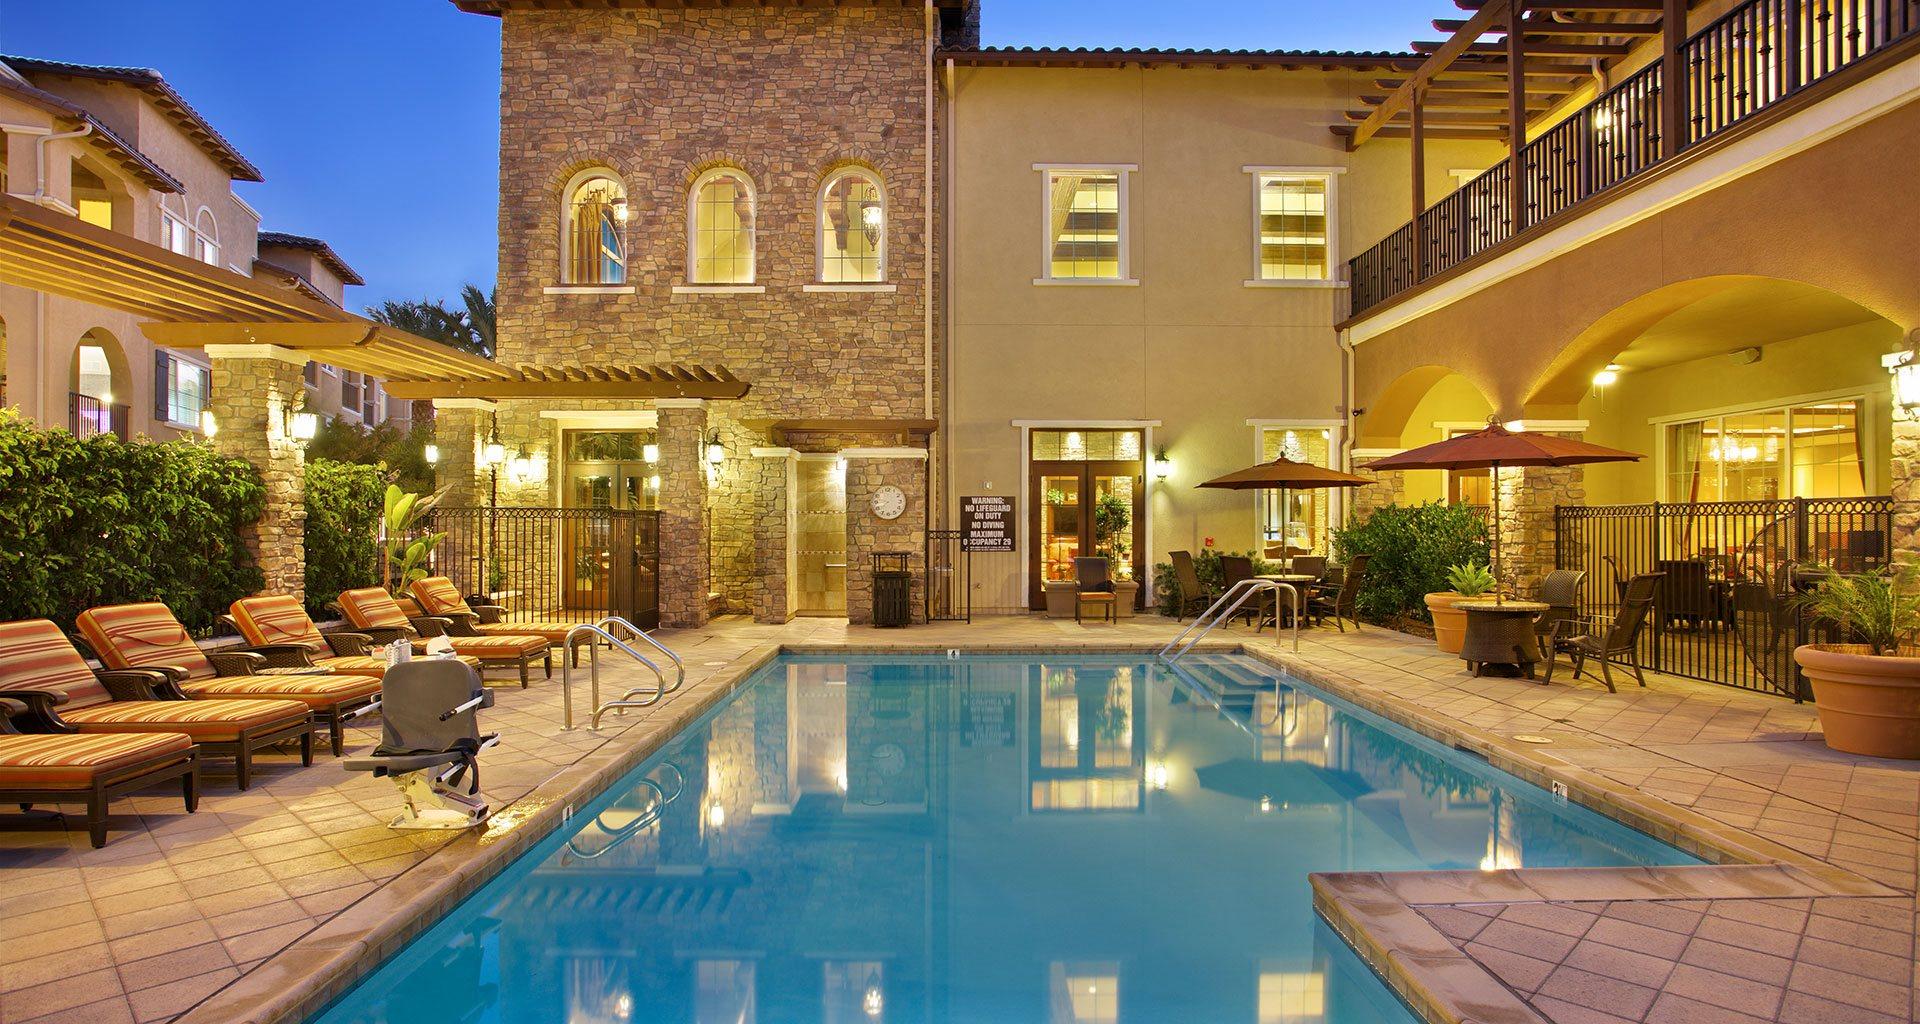 Lounge Swimming Pool With Cabana at Meridian at Lake San Marcos, California